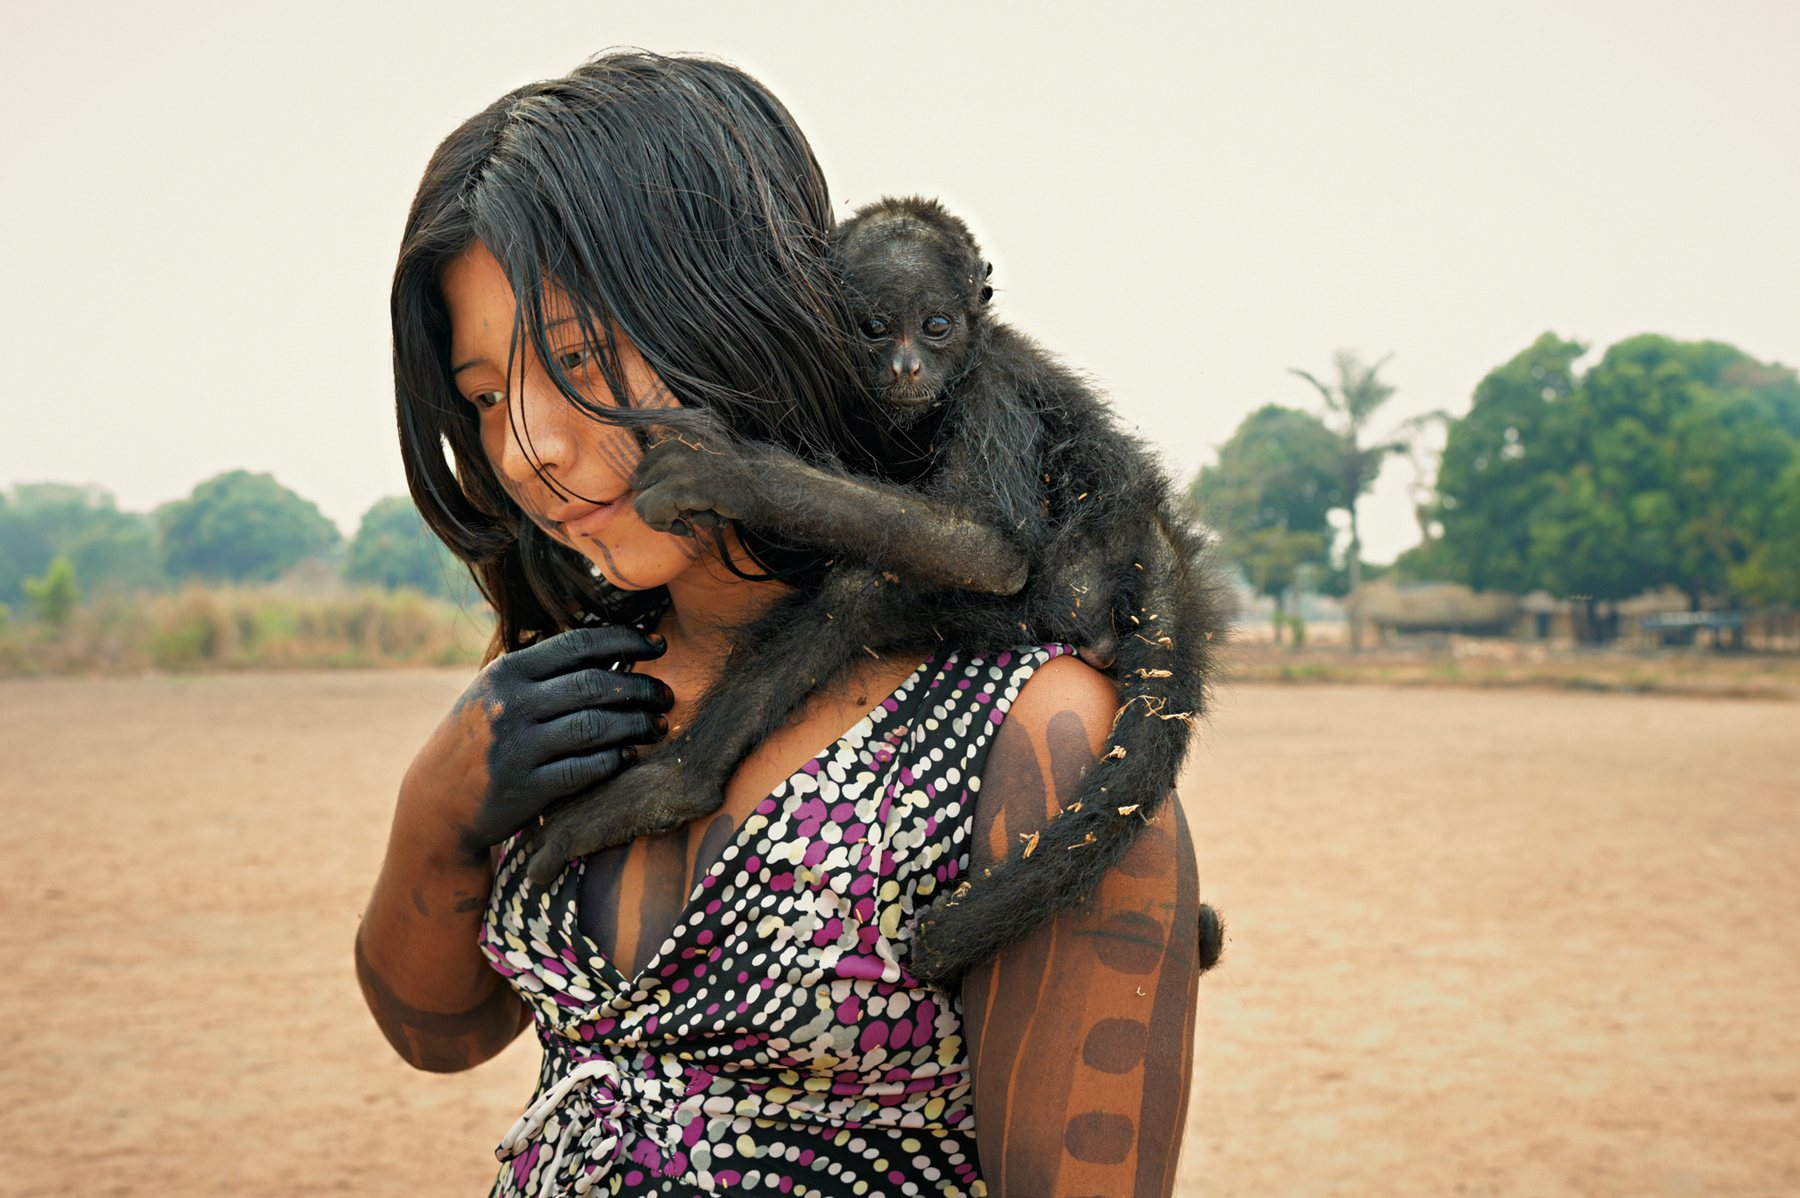 Pygmy women nude sex pic